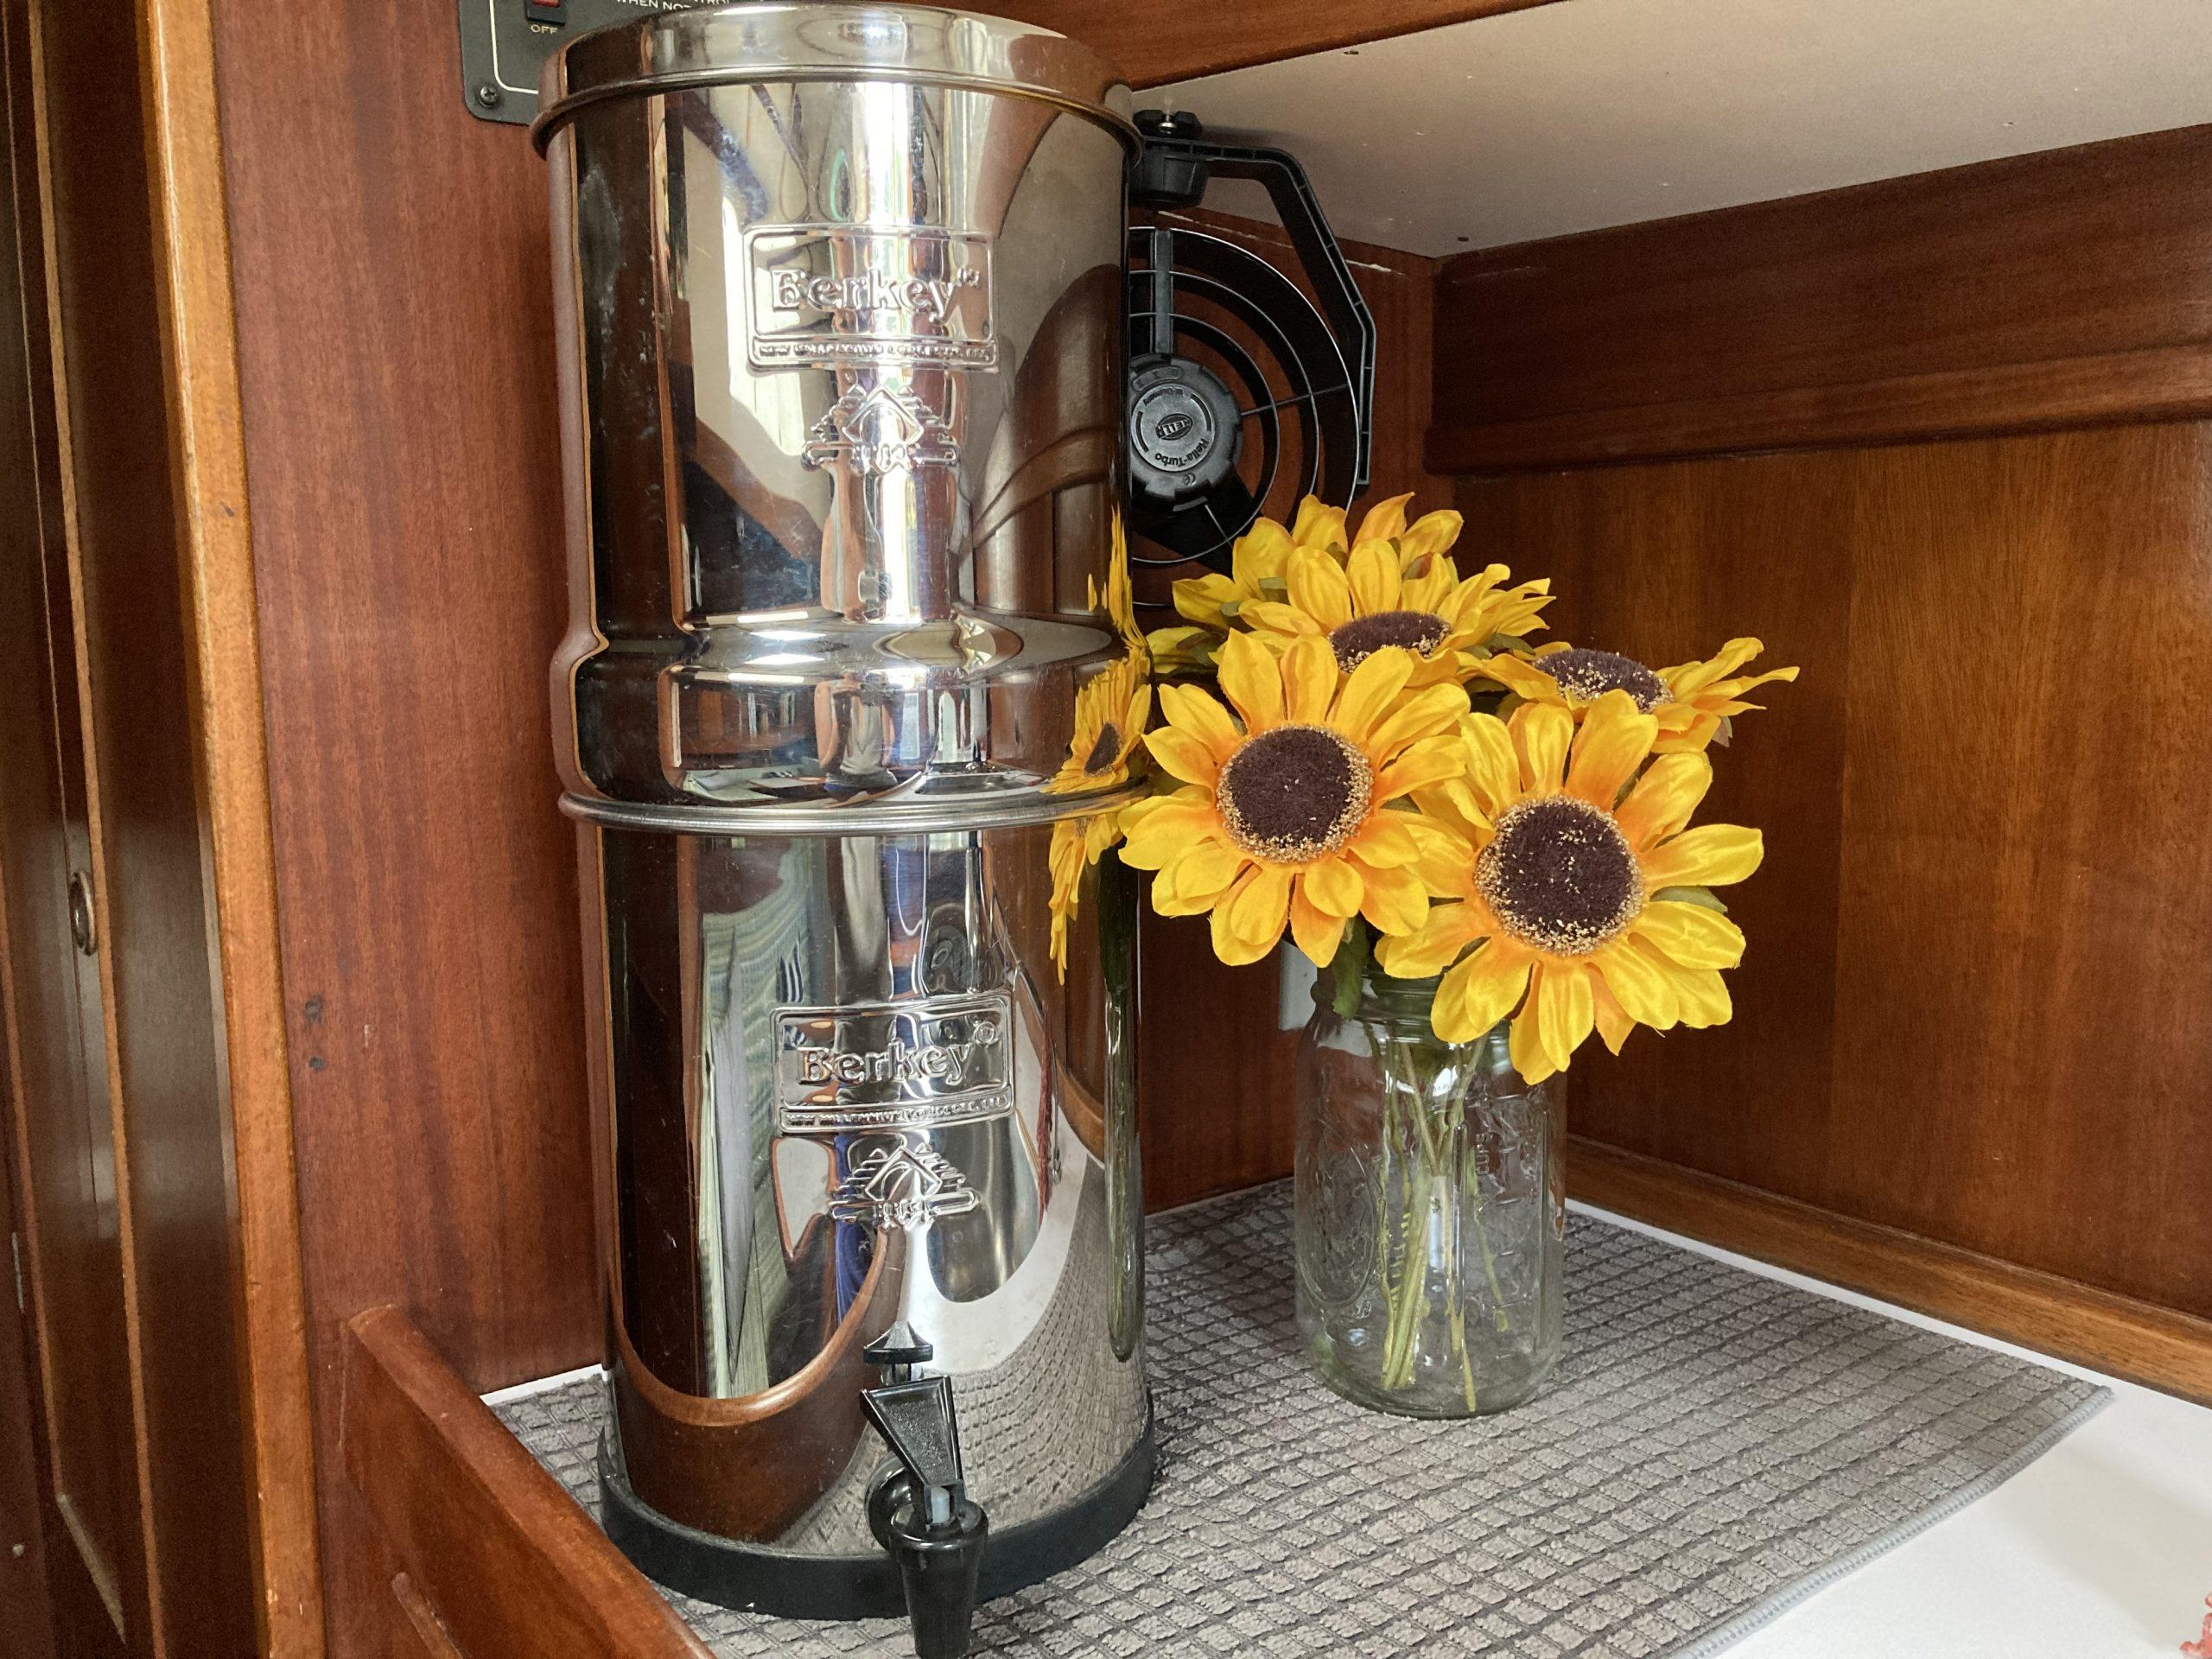 Berkey stainless steel water filter